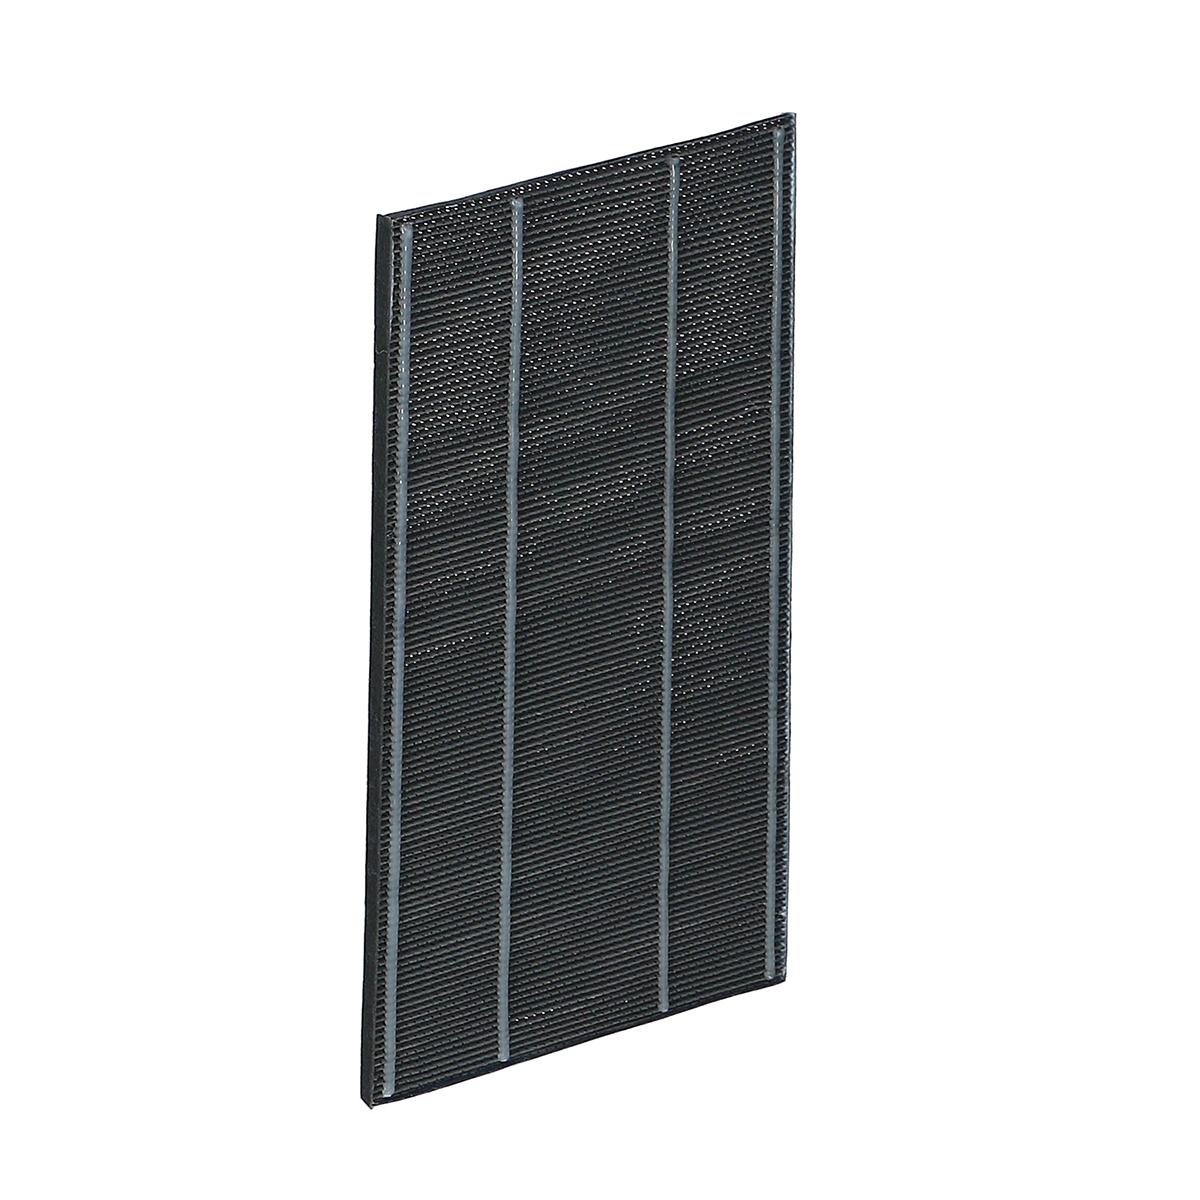 Sharp KC-A50EUW - filtr węglowy